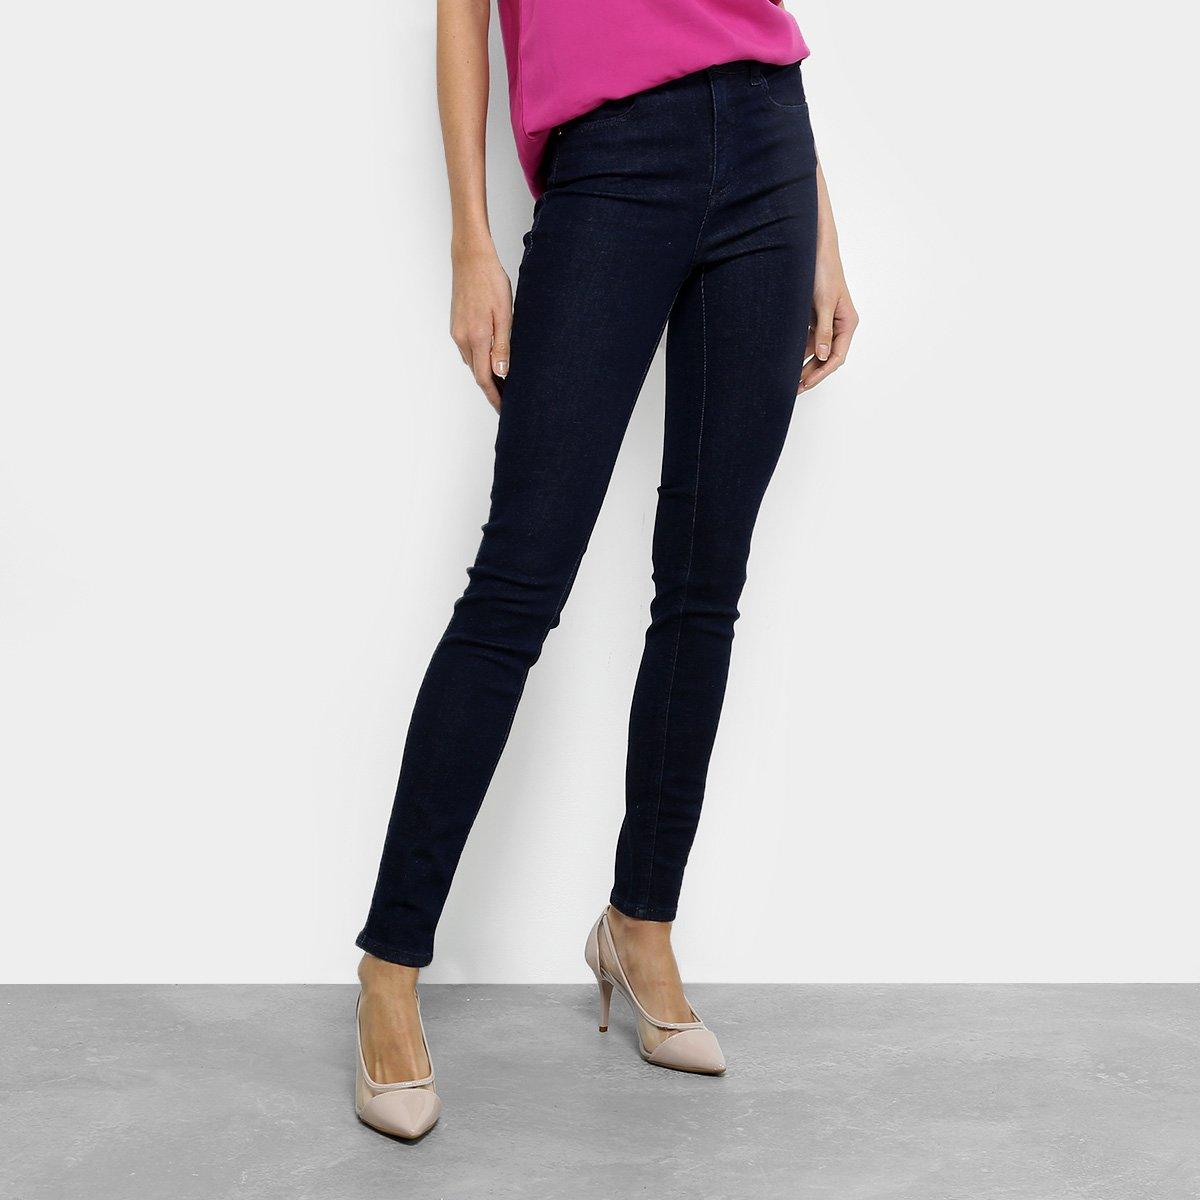 eb307e12b Calça Jeans Skinny Colcci Cintura Alta Feminina